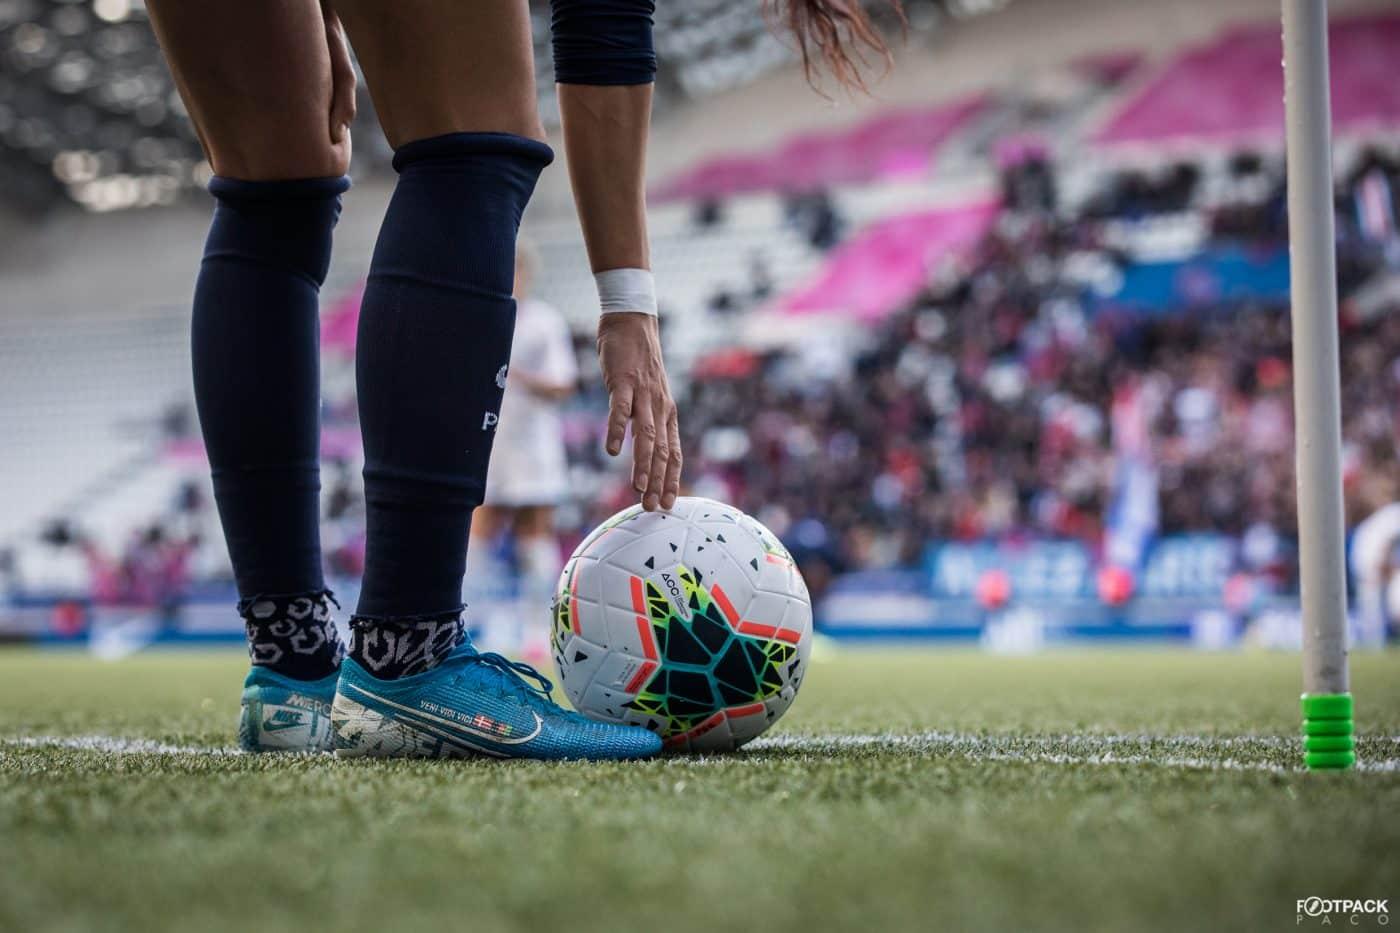 au-stade-paris-saint-germain-psg-olympique-de-marseille-d1-feminine-arkema-footpack-19